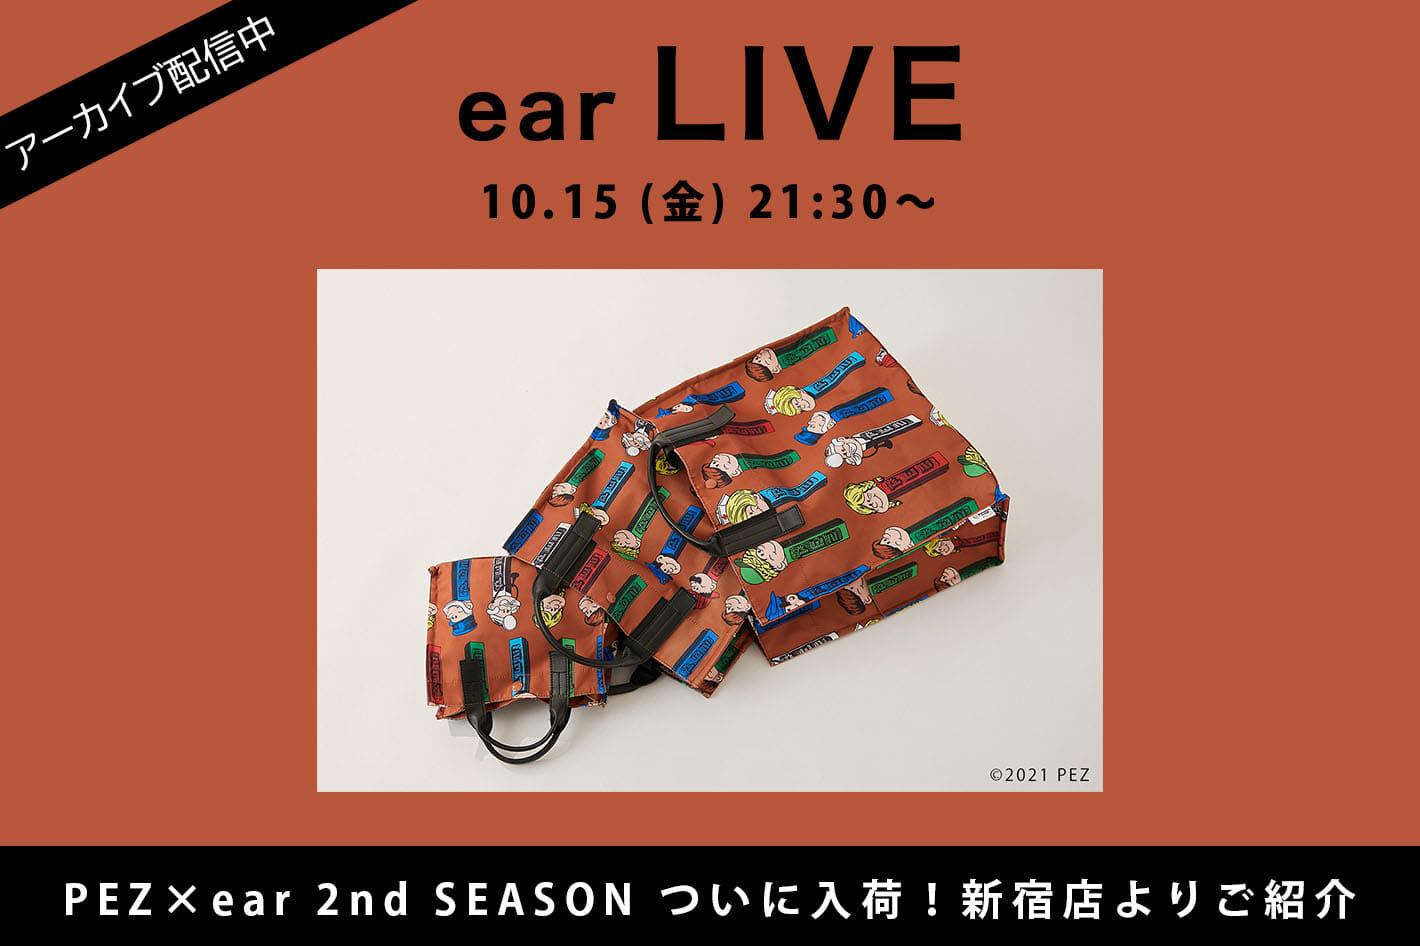 ear PAPILLONNER <ear LIVE>10/15 21:30~ライブ配信スタート!ついに入荷PEZ×ear 2ndシーズンアイテムを新宿店よりご紹介